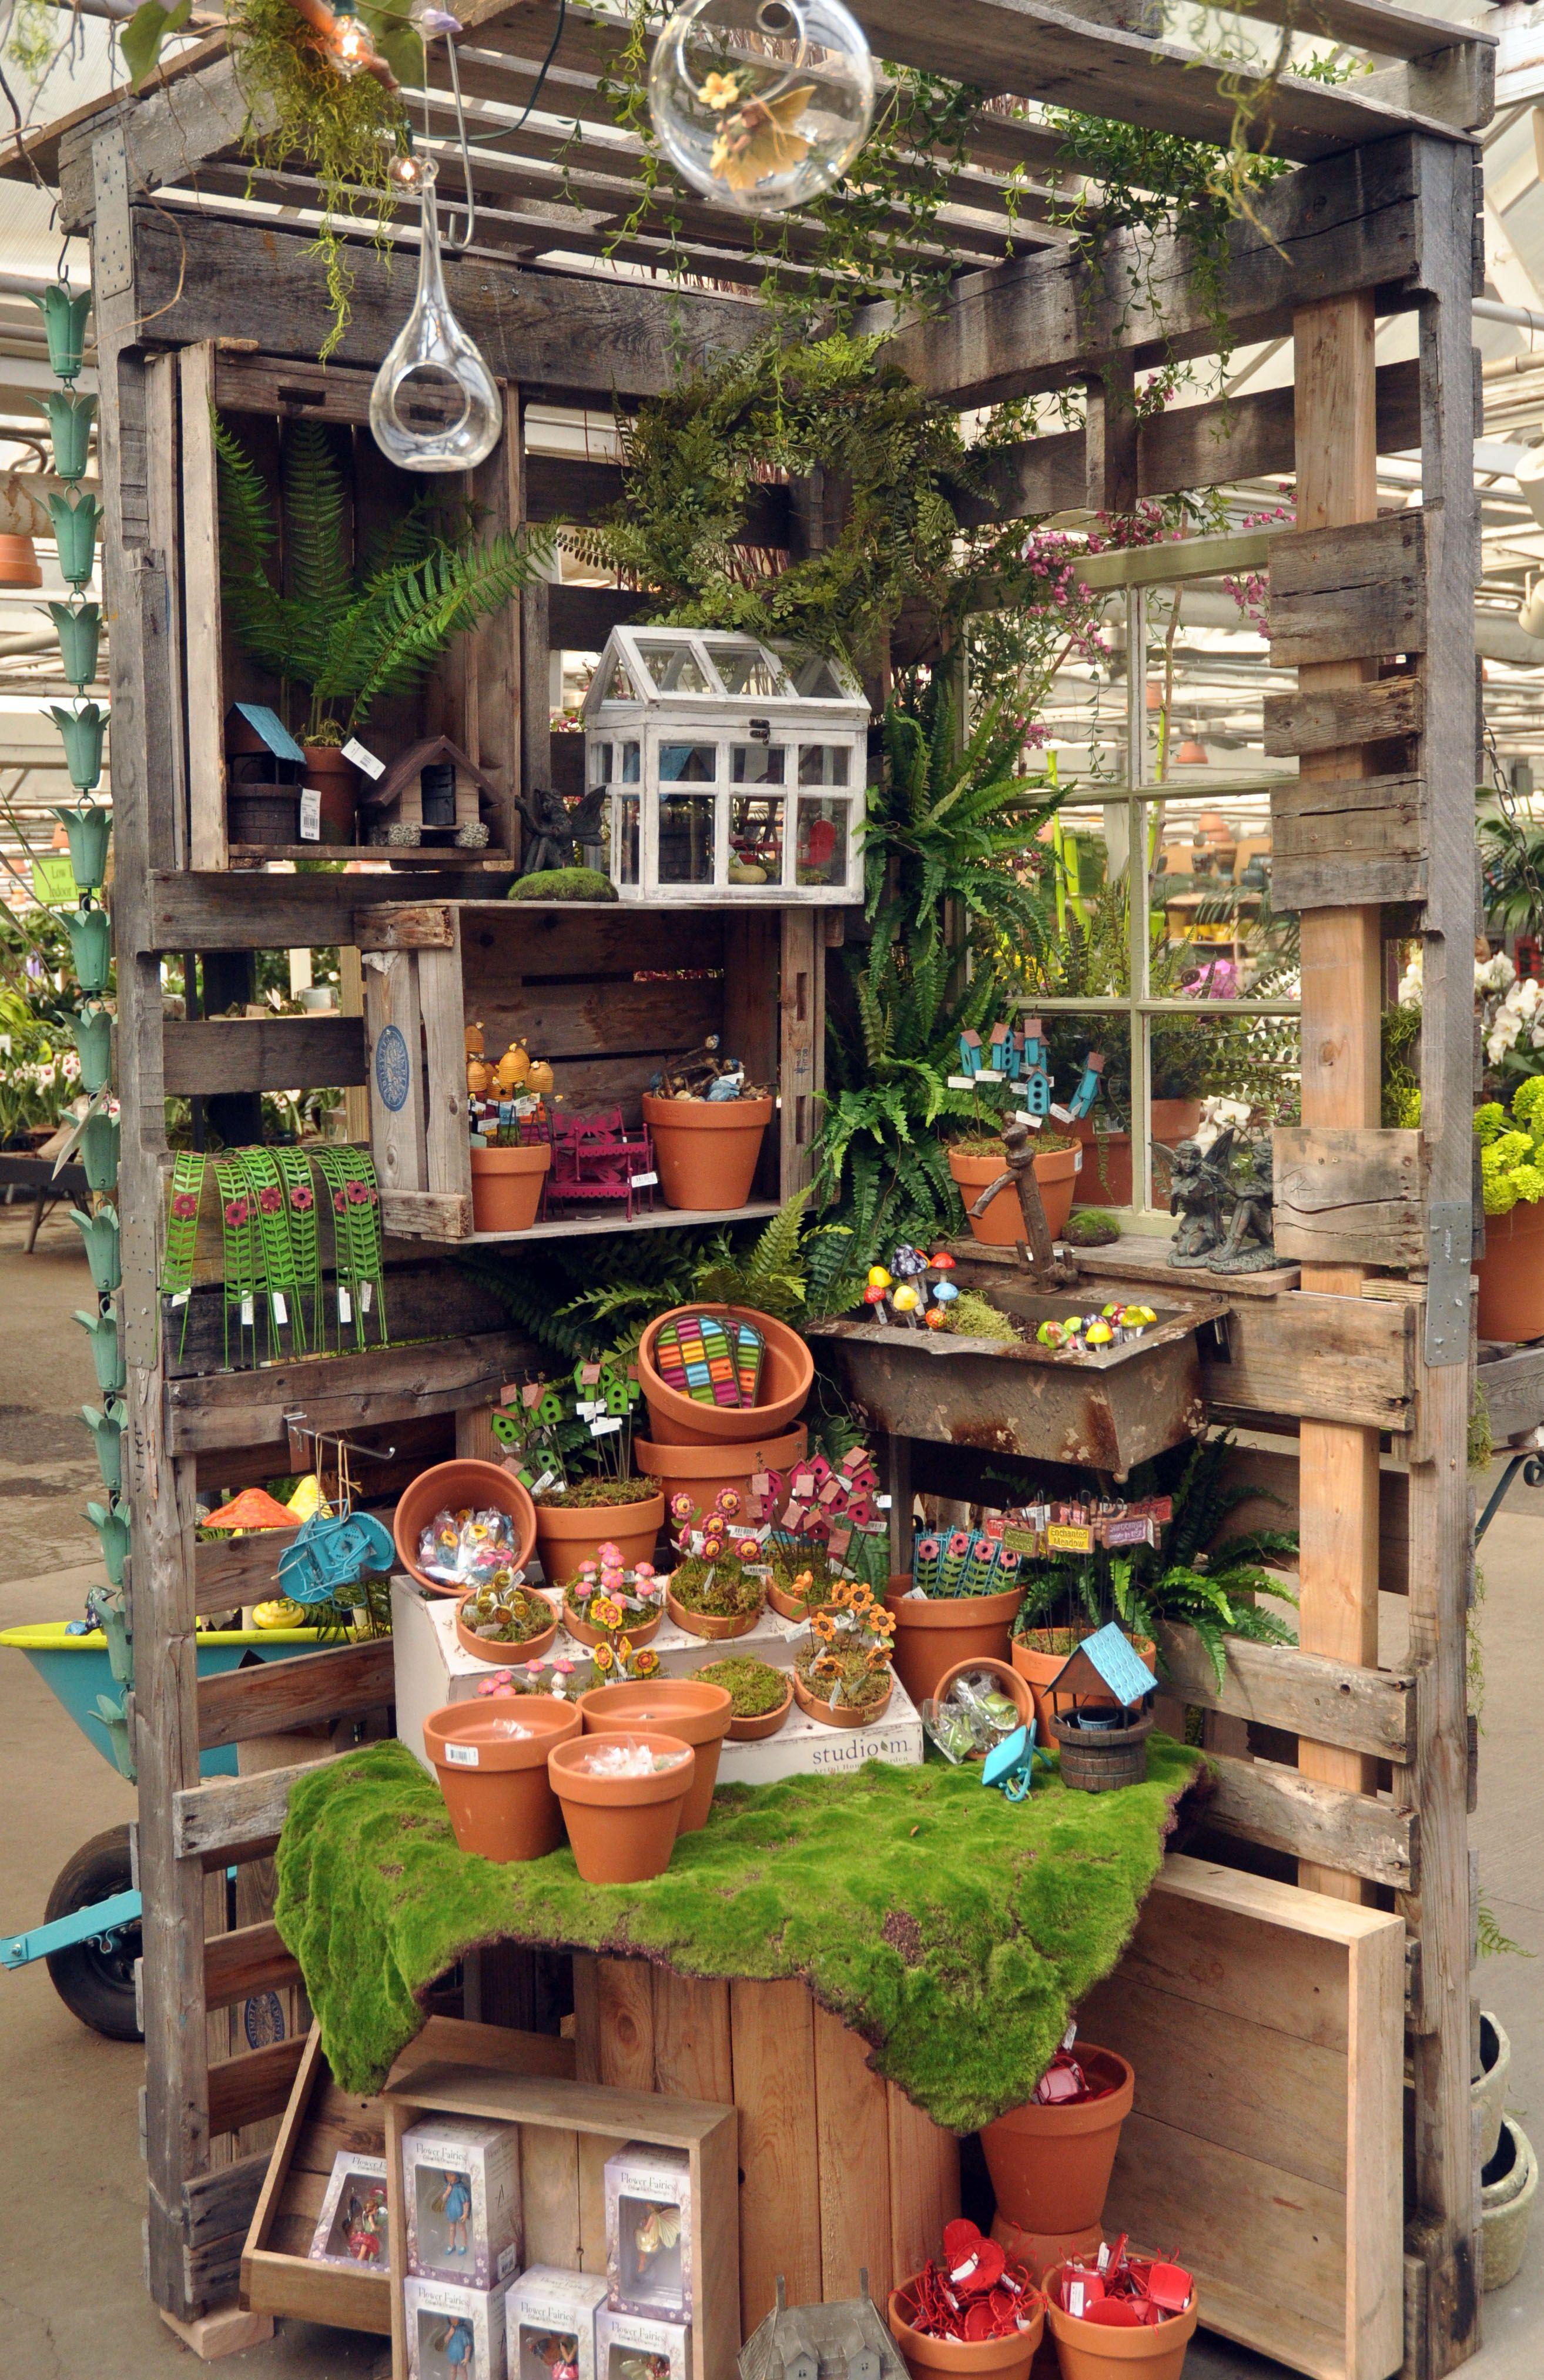 Fairlys | Jardinerie - garden center - pet store - animalerie ...